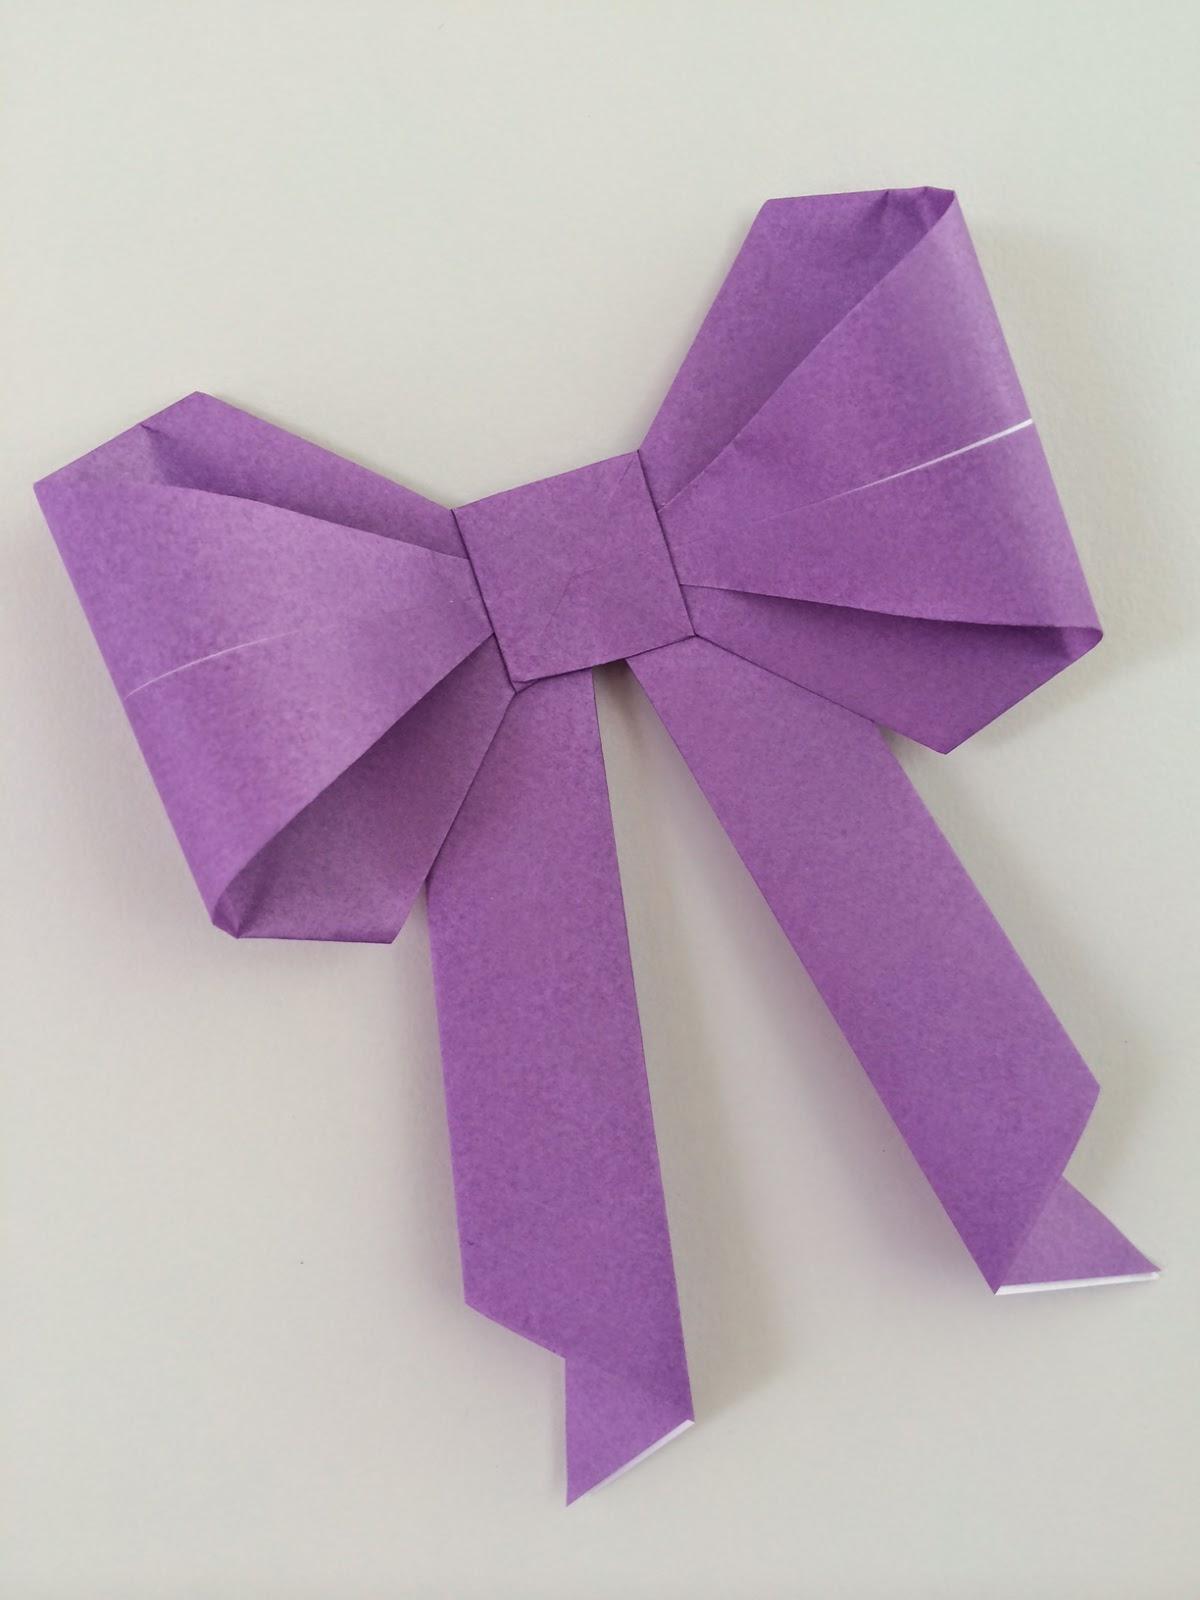 Random Crafting Adventures: Origami Bows - photo#26